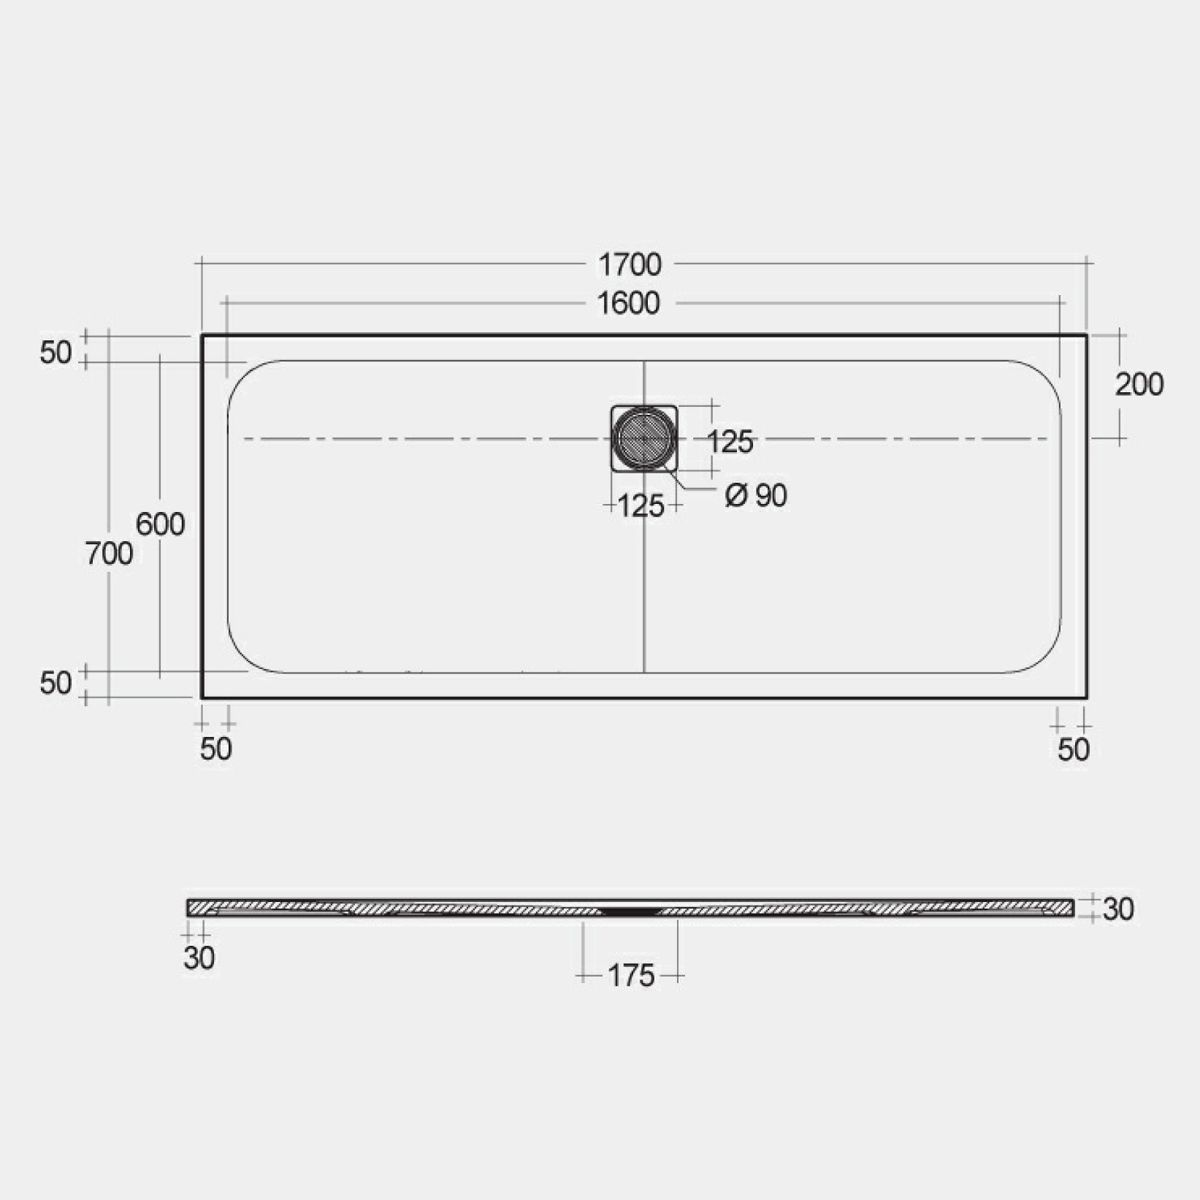 RAK Feeling Cappuccino Rectangular Shower Tray 1700 x 700mm Measurements